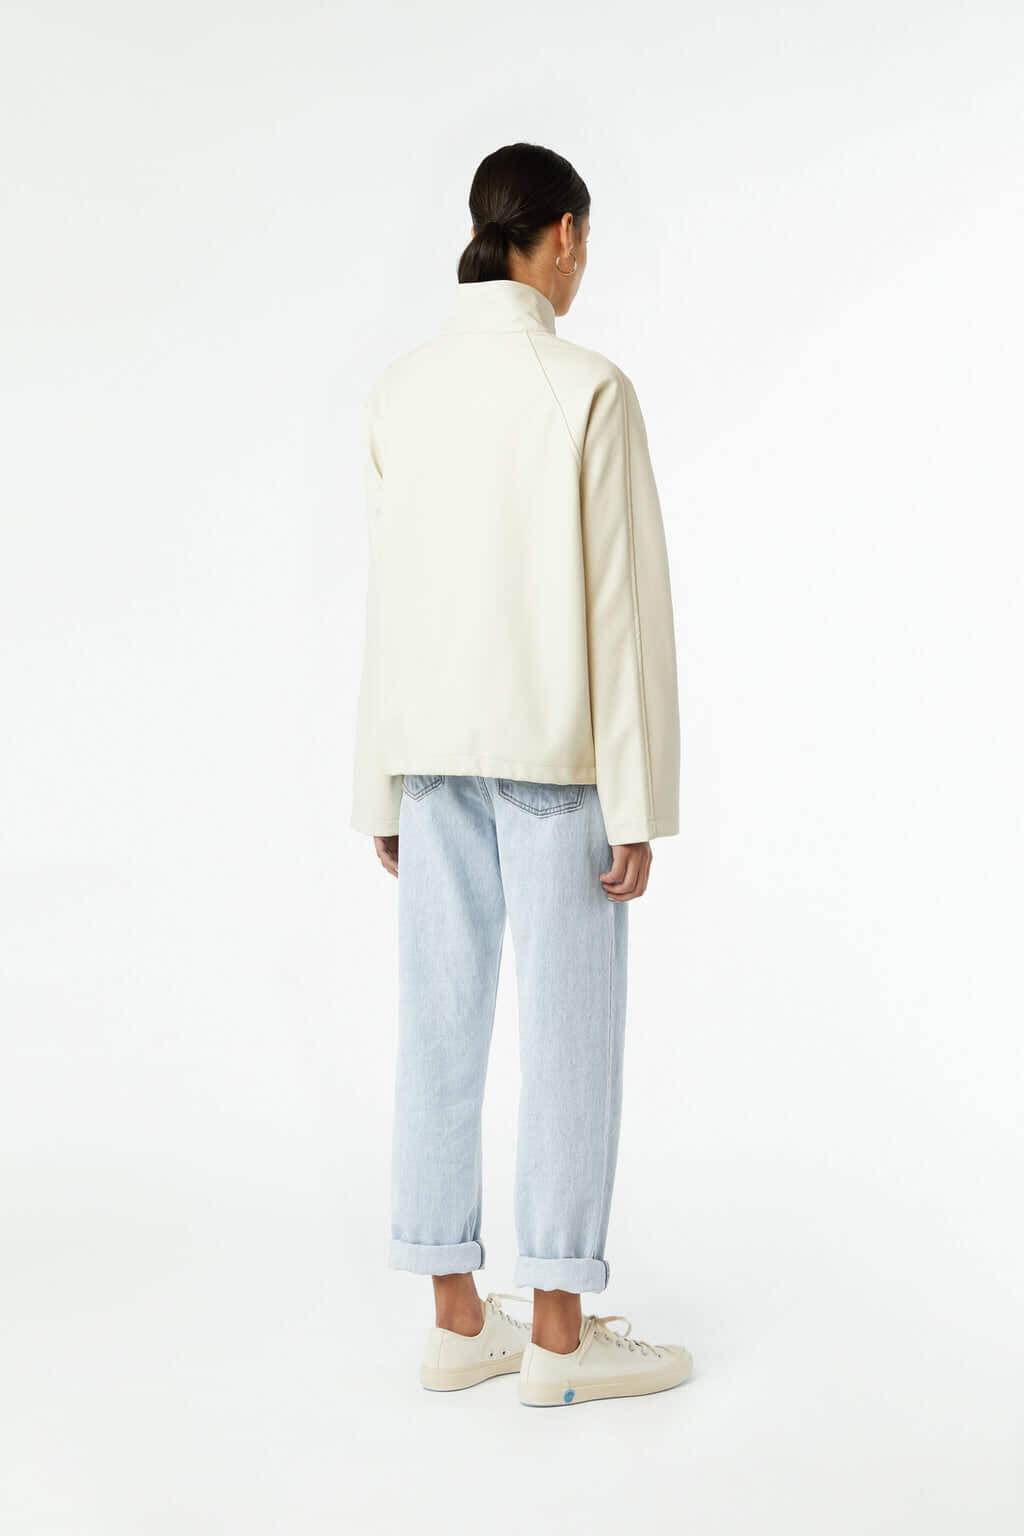 Jacket J001 Cream 4